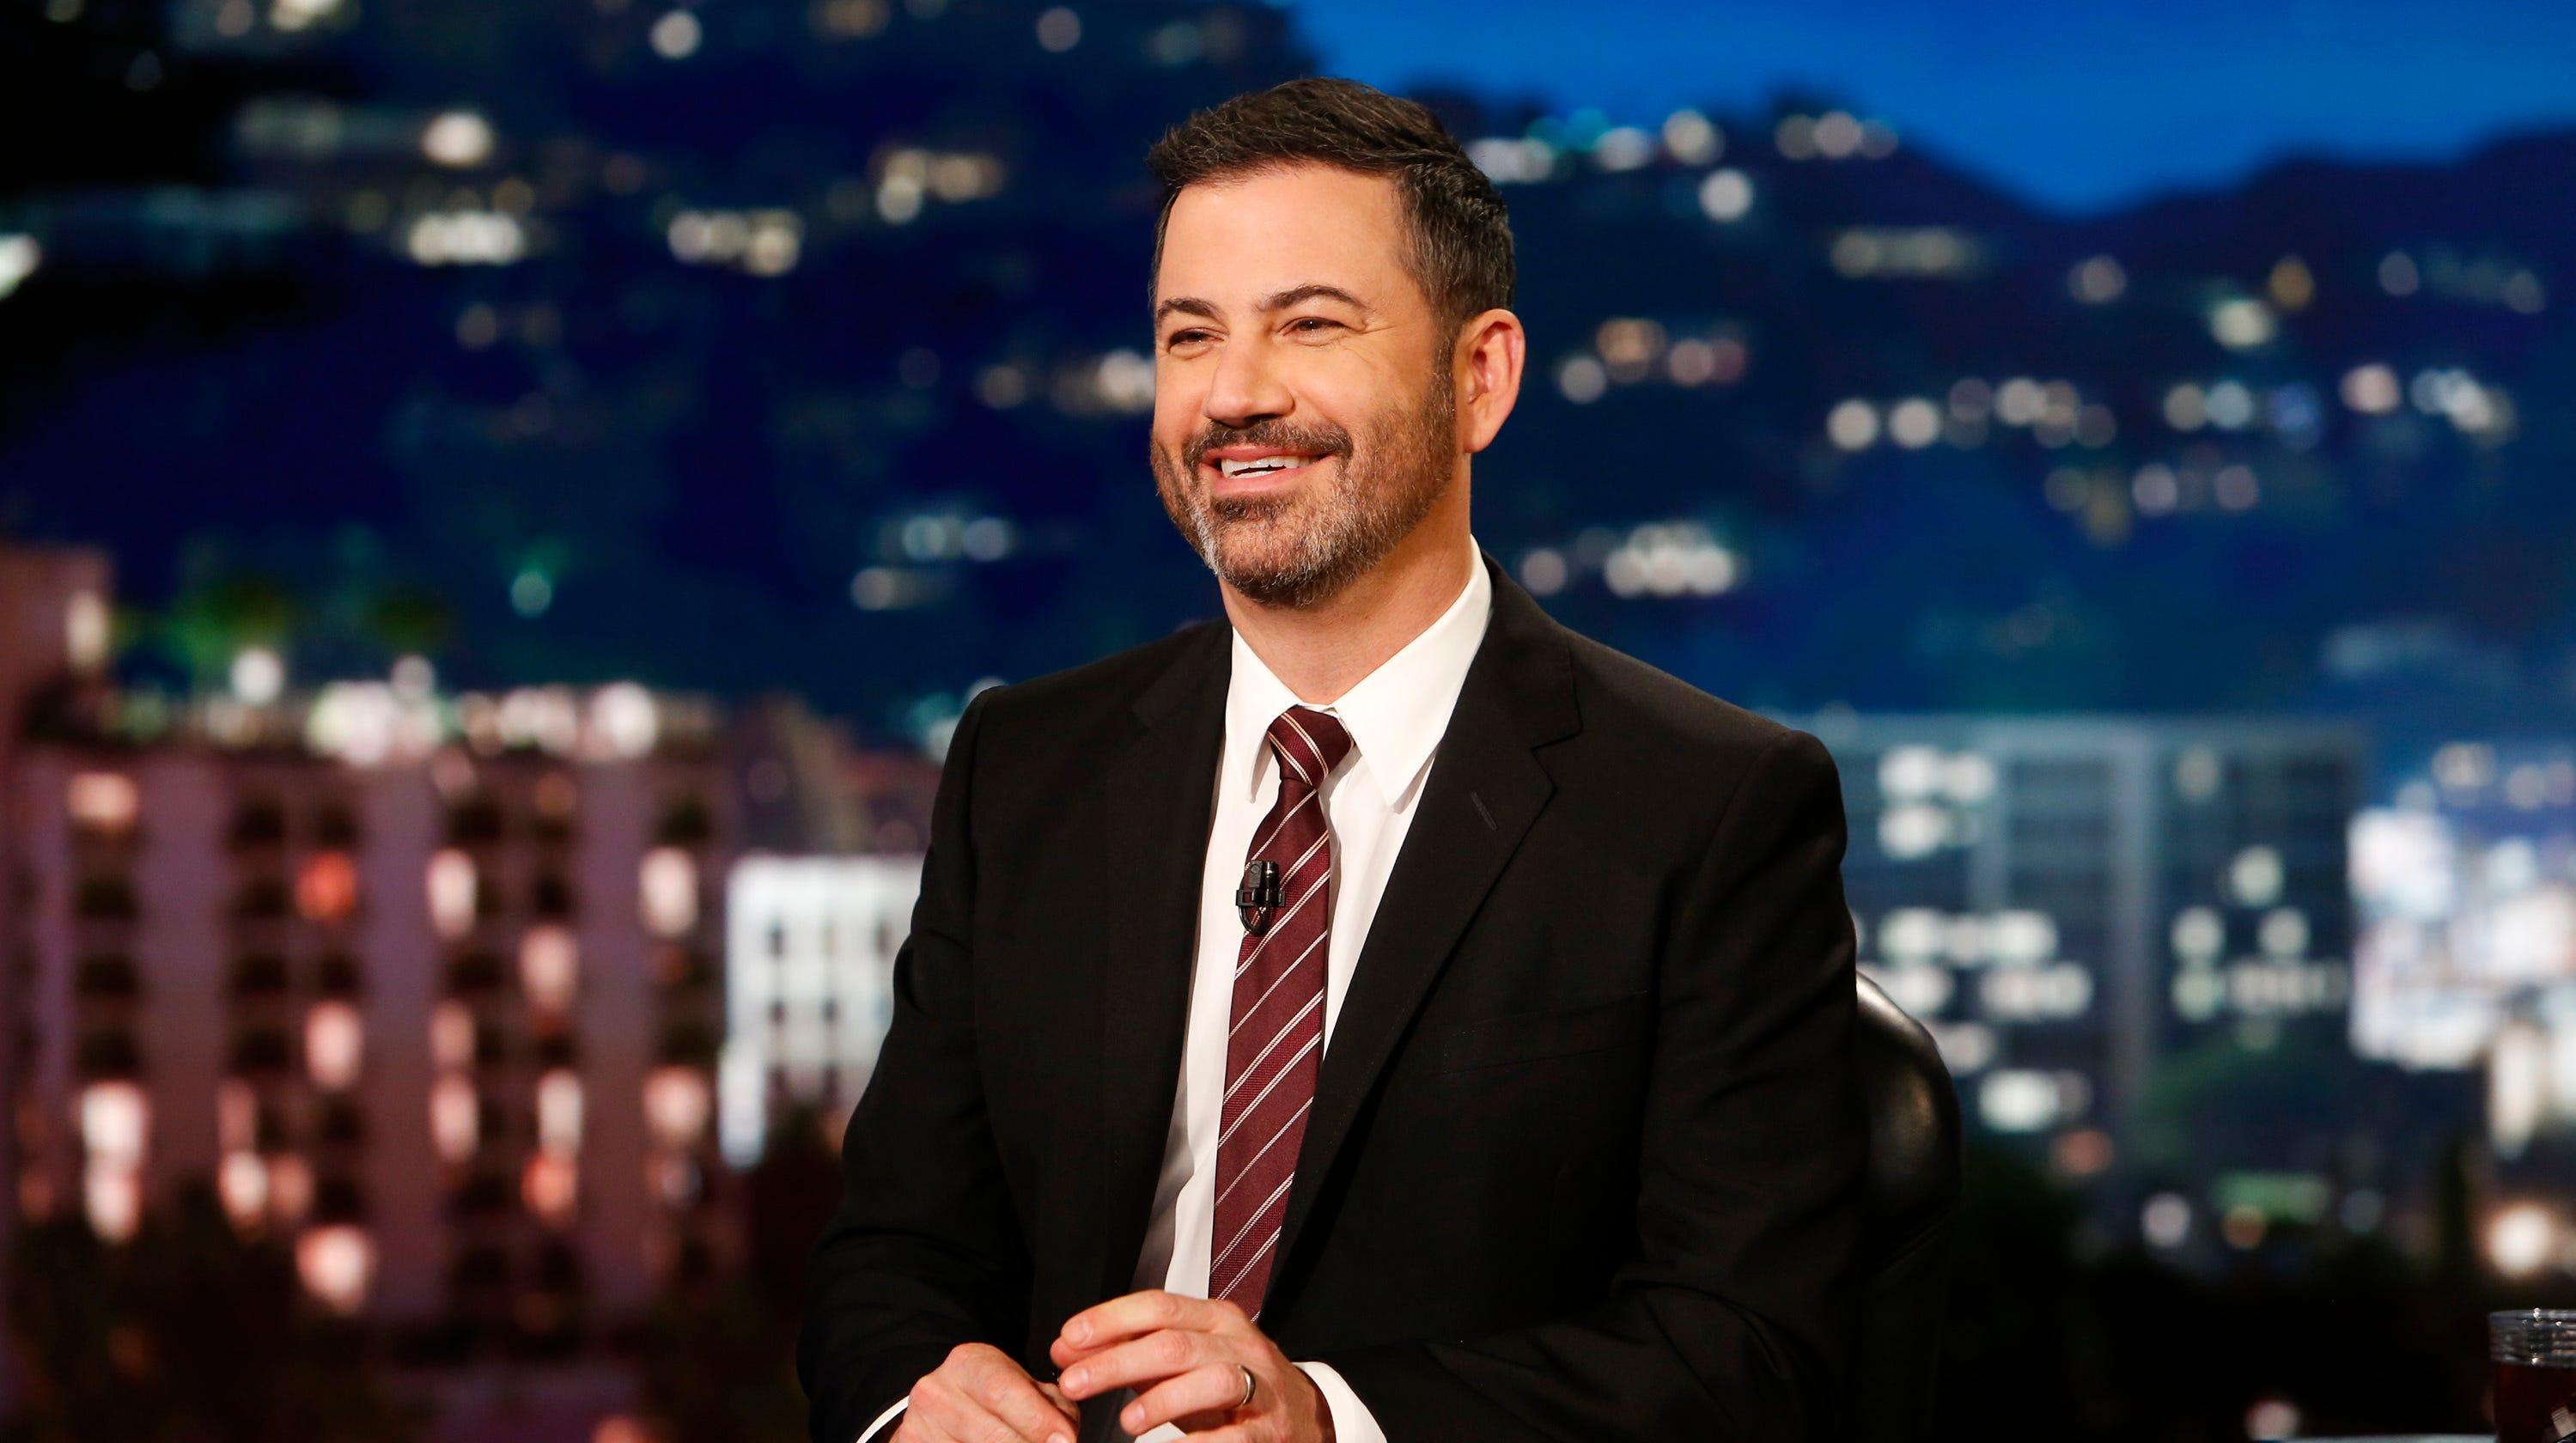 Jimmy Kimmel Celebrates Son Billy S Second Birthday Grateful Always The sidney kimmel medical college at thomas jefferson university (kimmel) has an application deadline of nov. jimmy kimmel celebrates son billy s